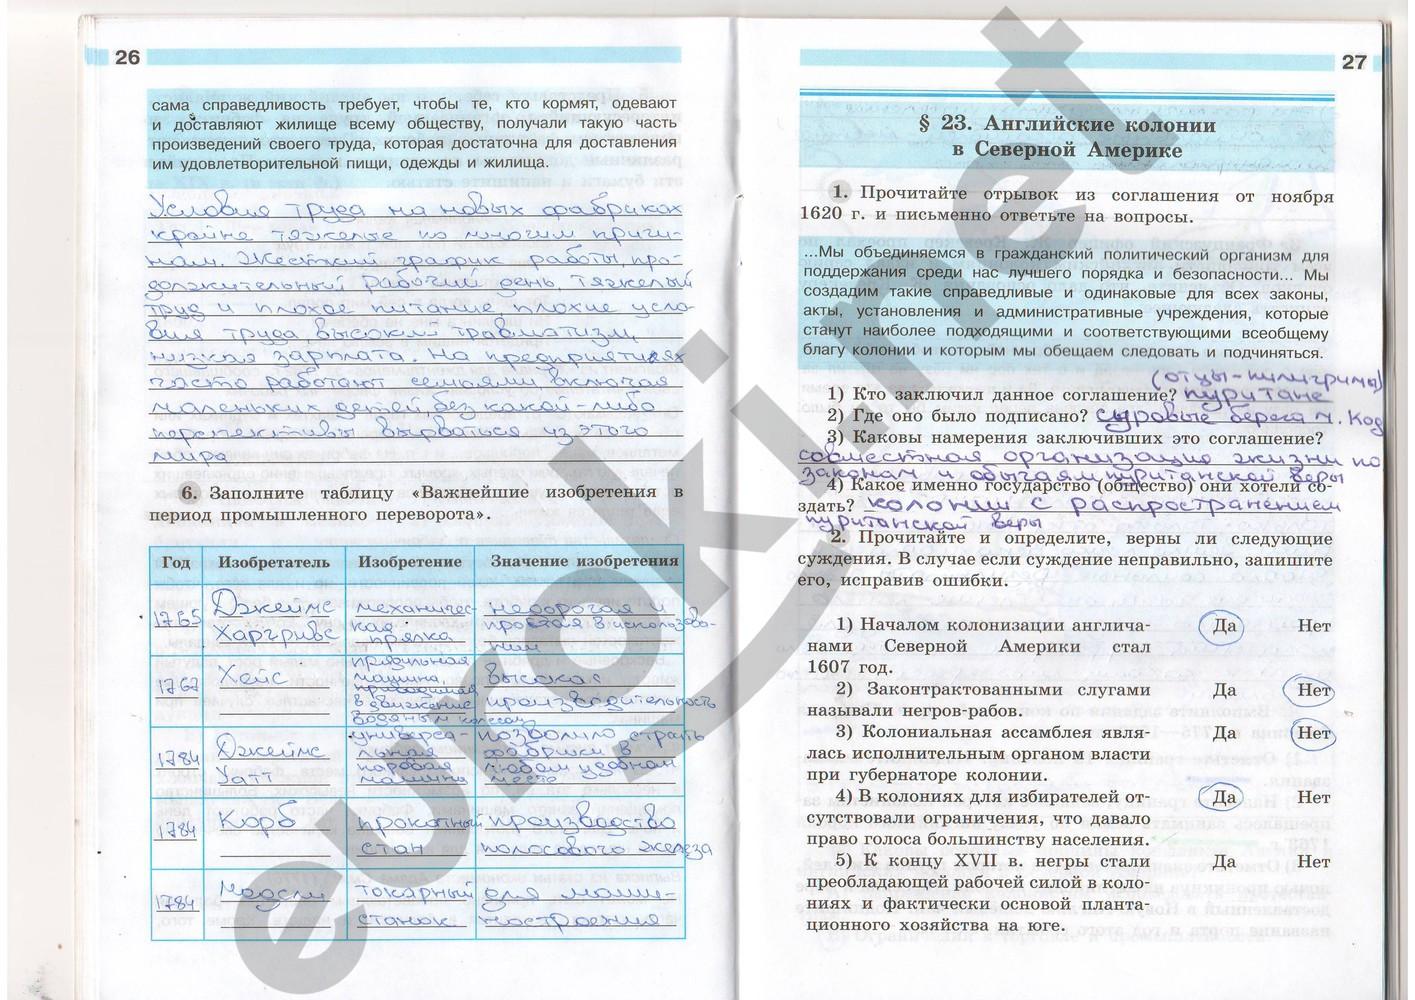 Гдз по тестам по русскому 7 класс хаустова